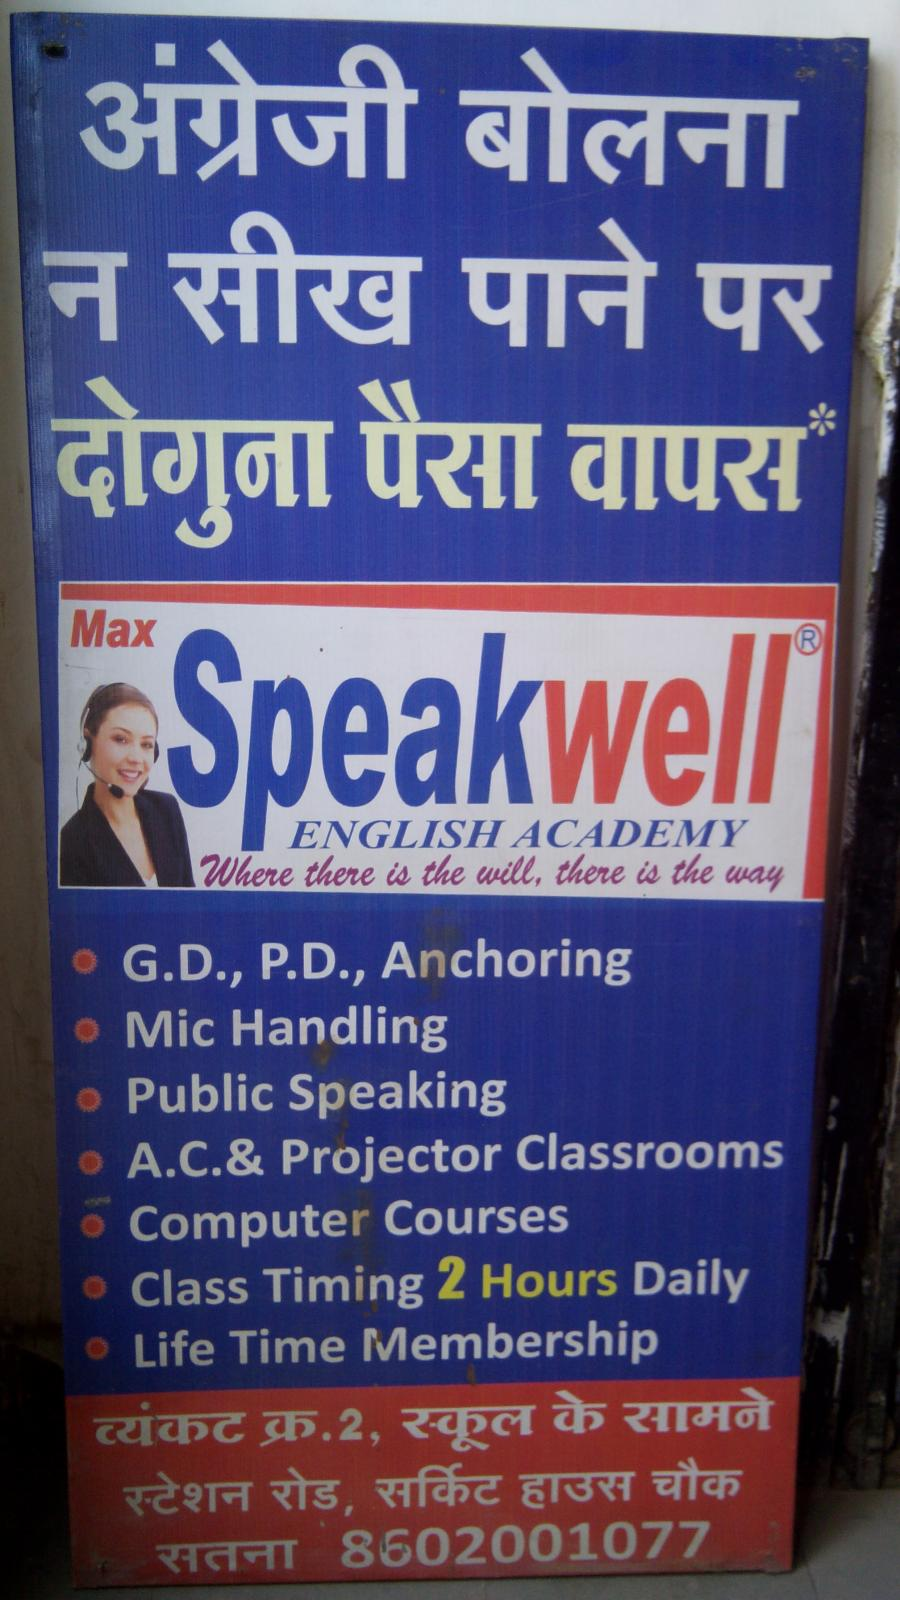 Max Speak Well English Academy